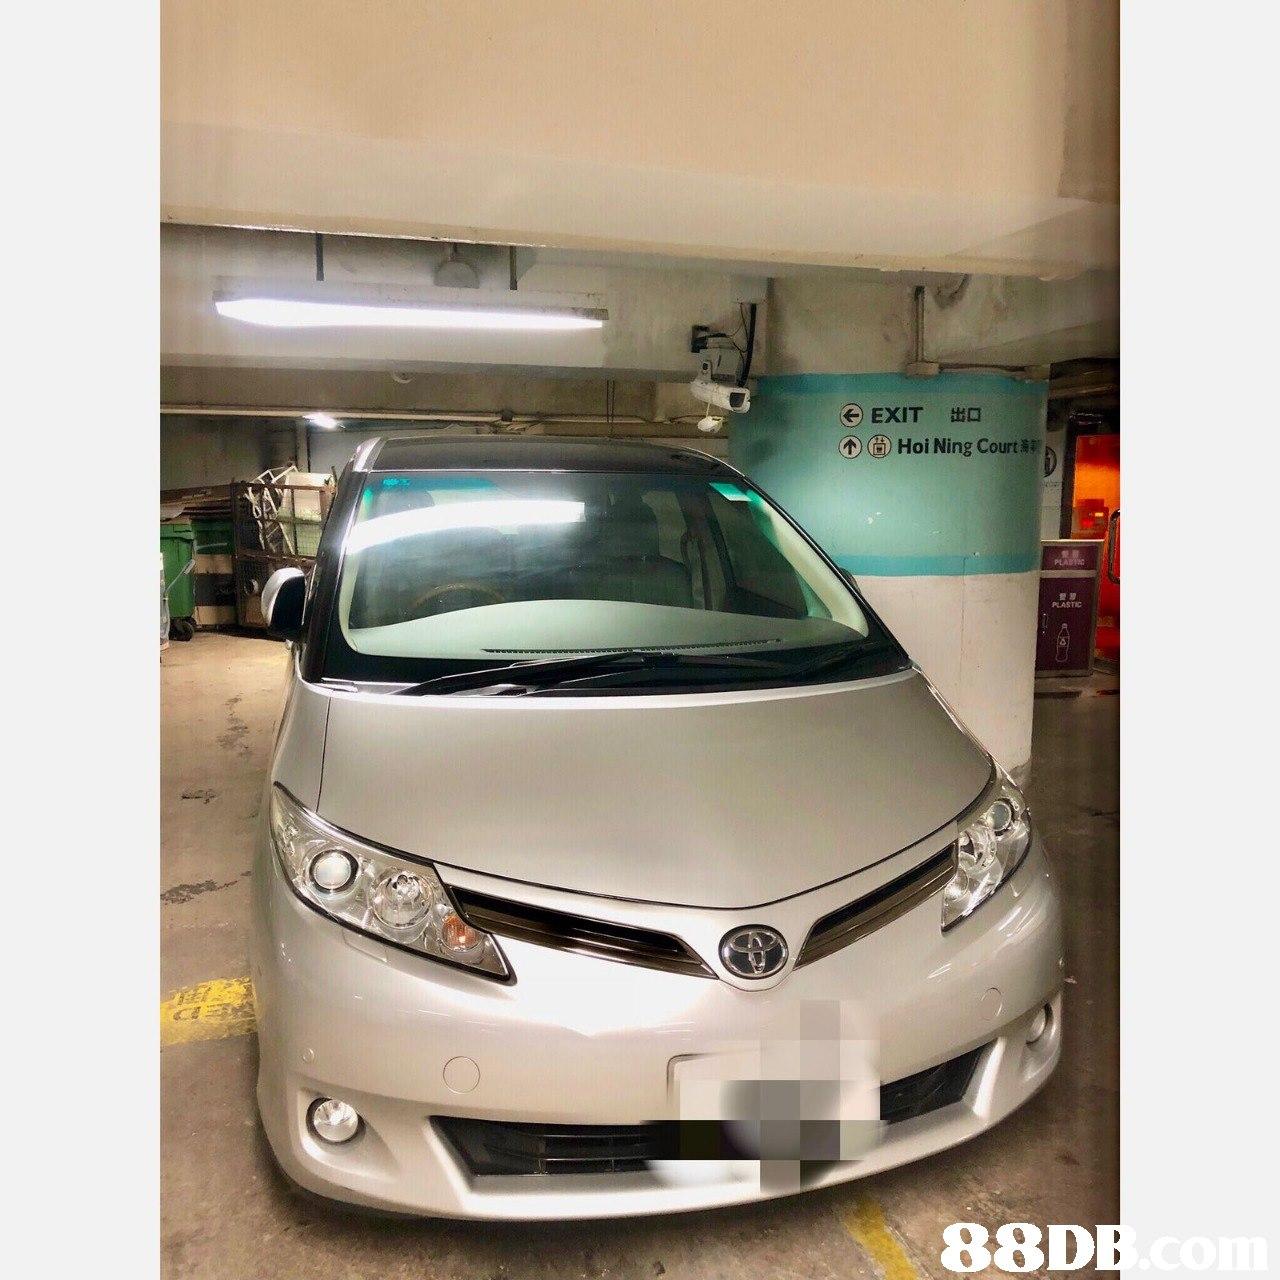 EXIT出口 ) Hoi Ning Court PLASTIC 88D  car